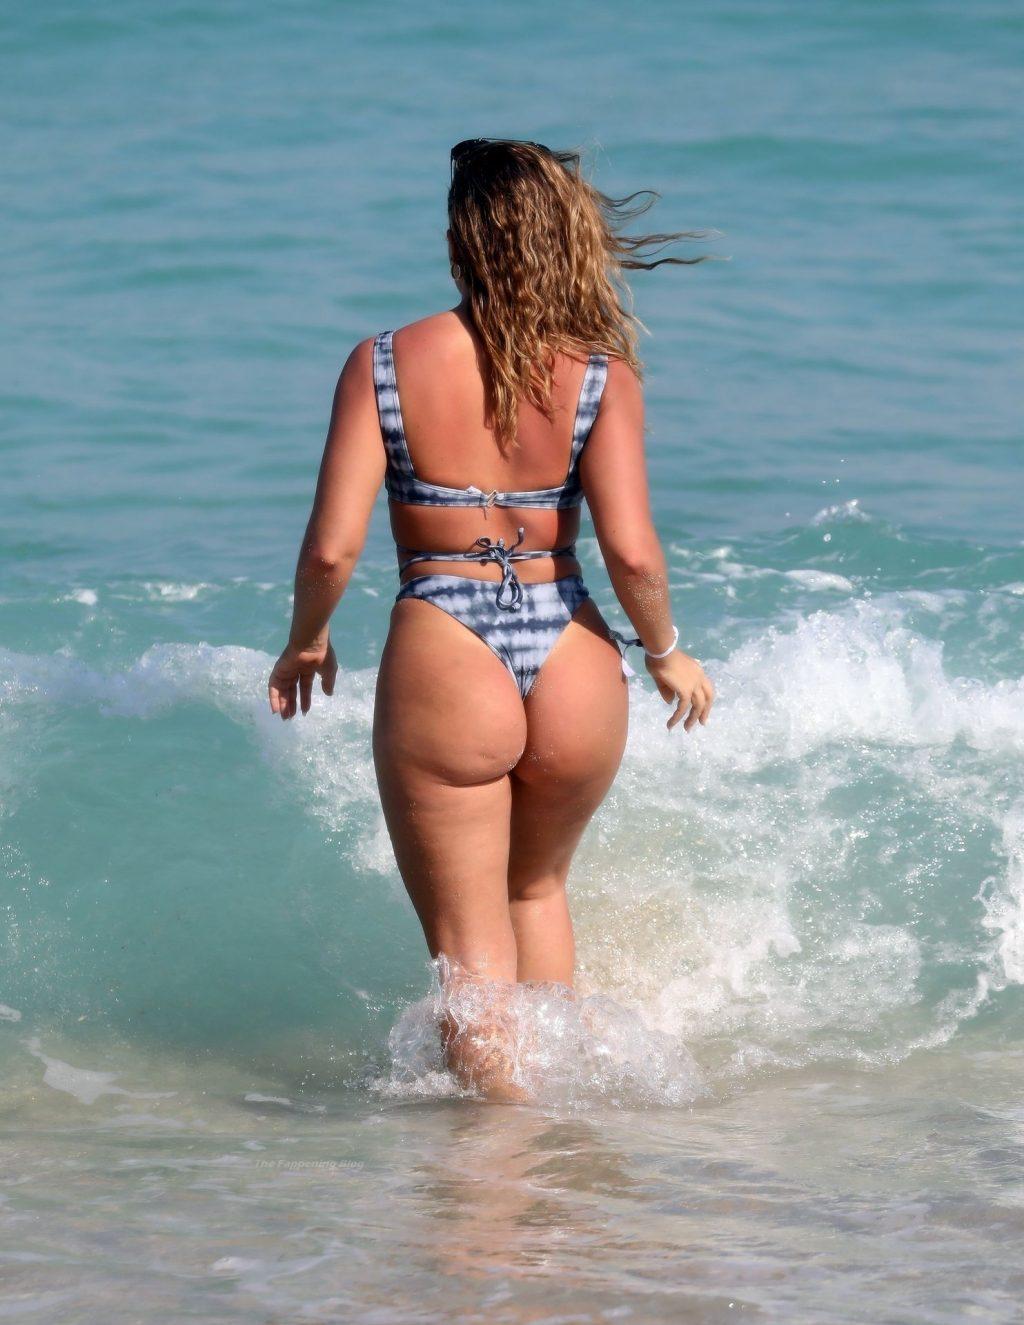 Eleonora Srugo Enjoys a Day at the beach in Miami (44 Photos)